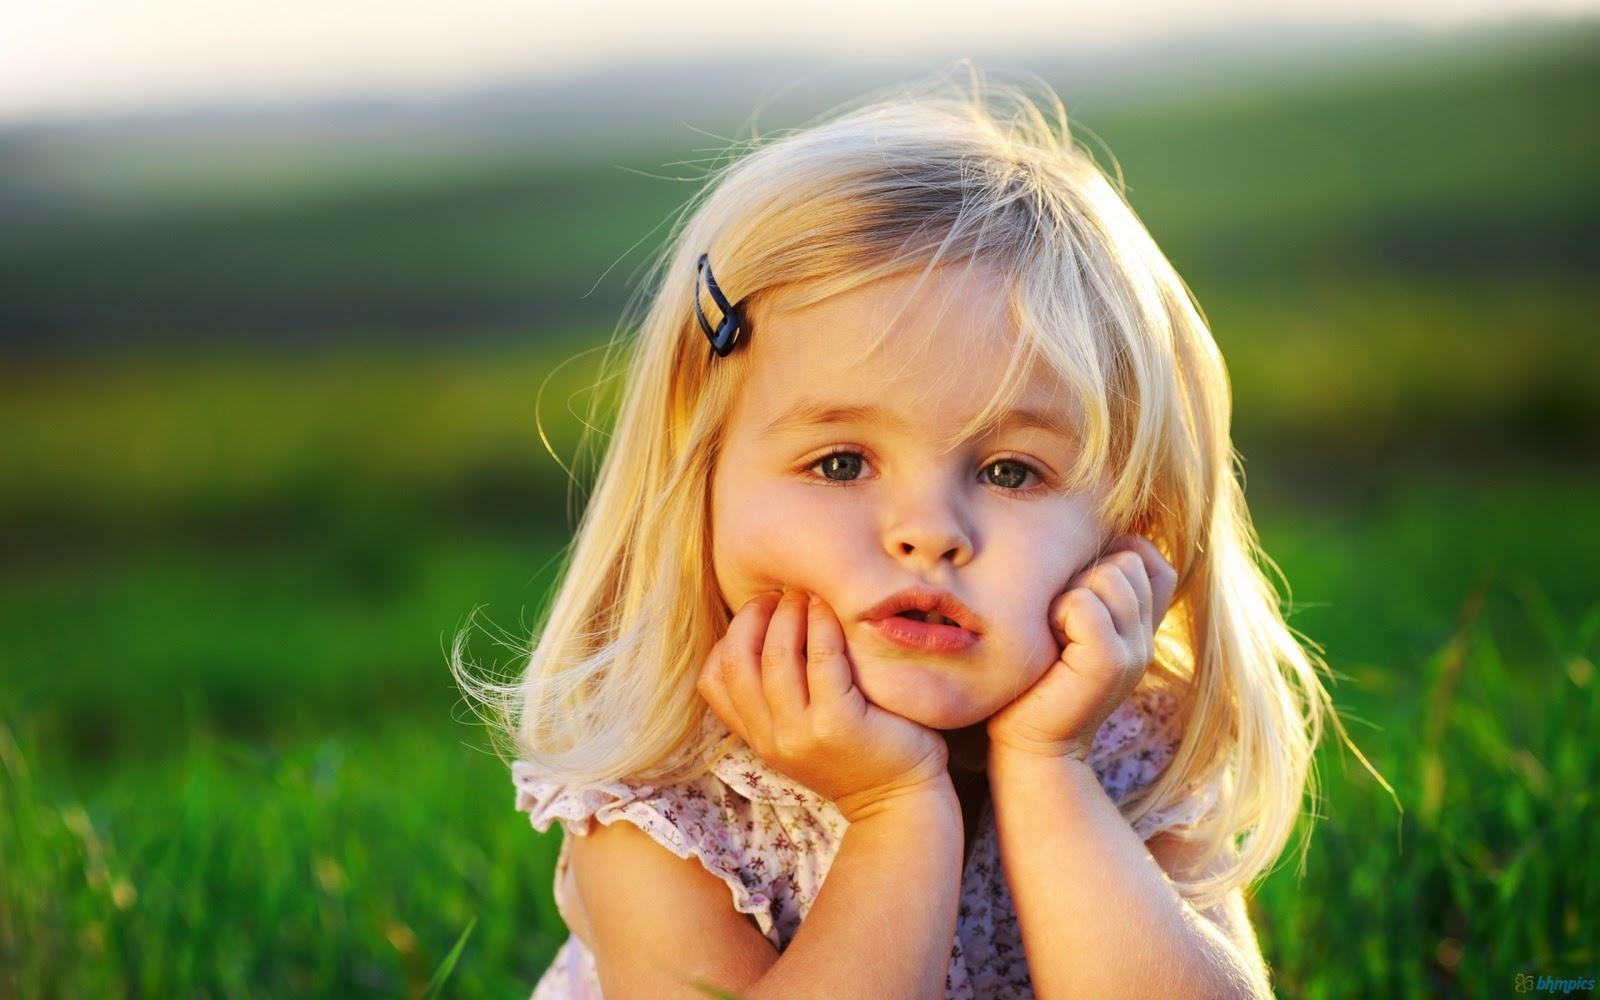 http://4.bp.blogspot.com/-lnJ6pryauyc/Tug6hGJP84I/AAAAAAAAAcE/9e6n9Uzk_7M/s1600/cute_little_baby_girl-1920x1200.jpg